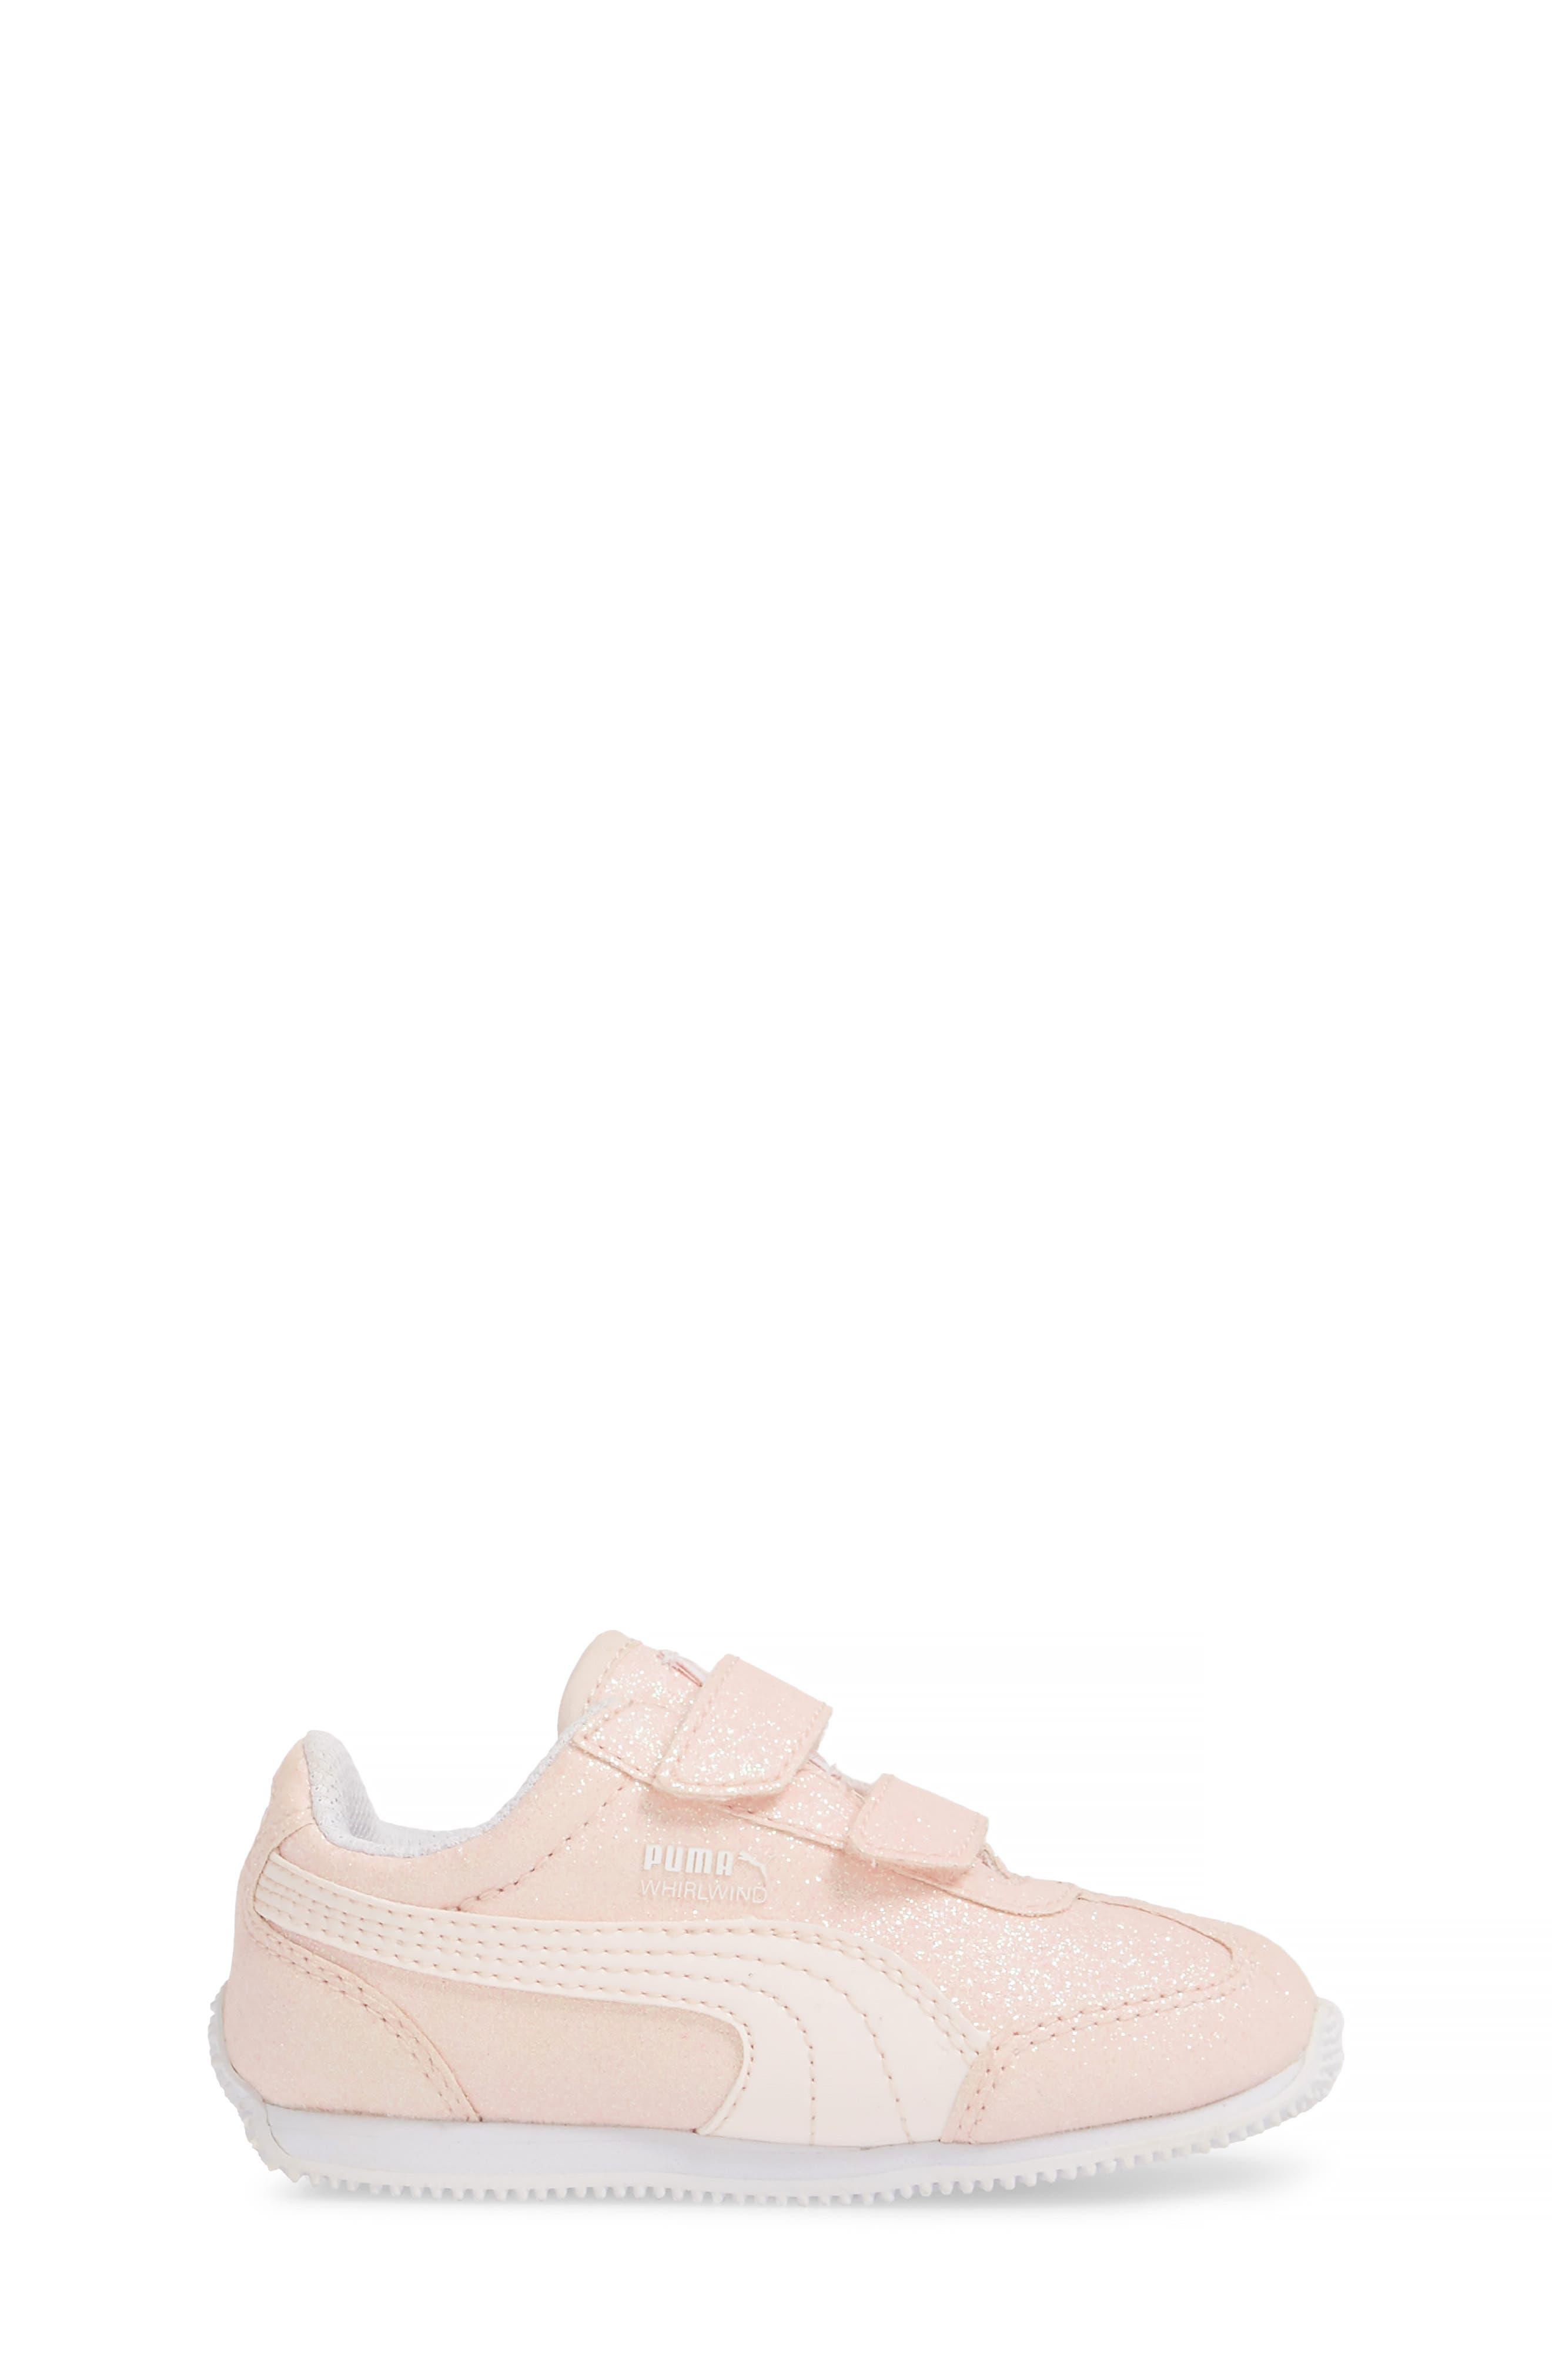 Whirlwind Glitz Sneaker,                             Alternate thumbnail 3, color,                             PEARL/ PUMA WHITE